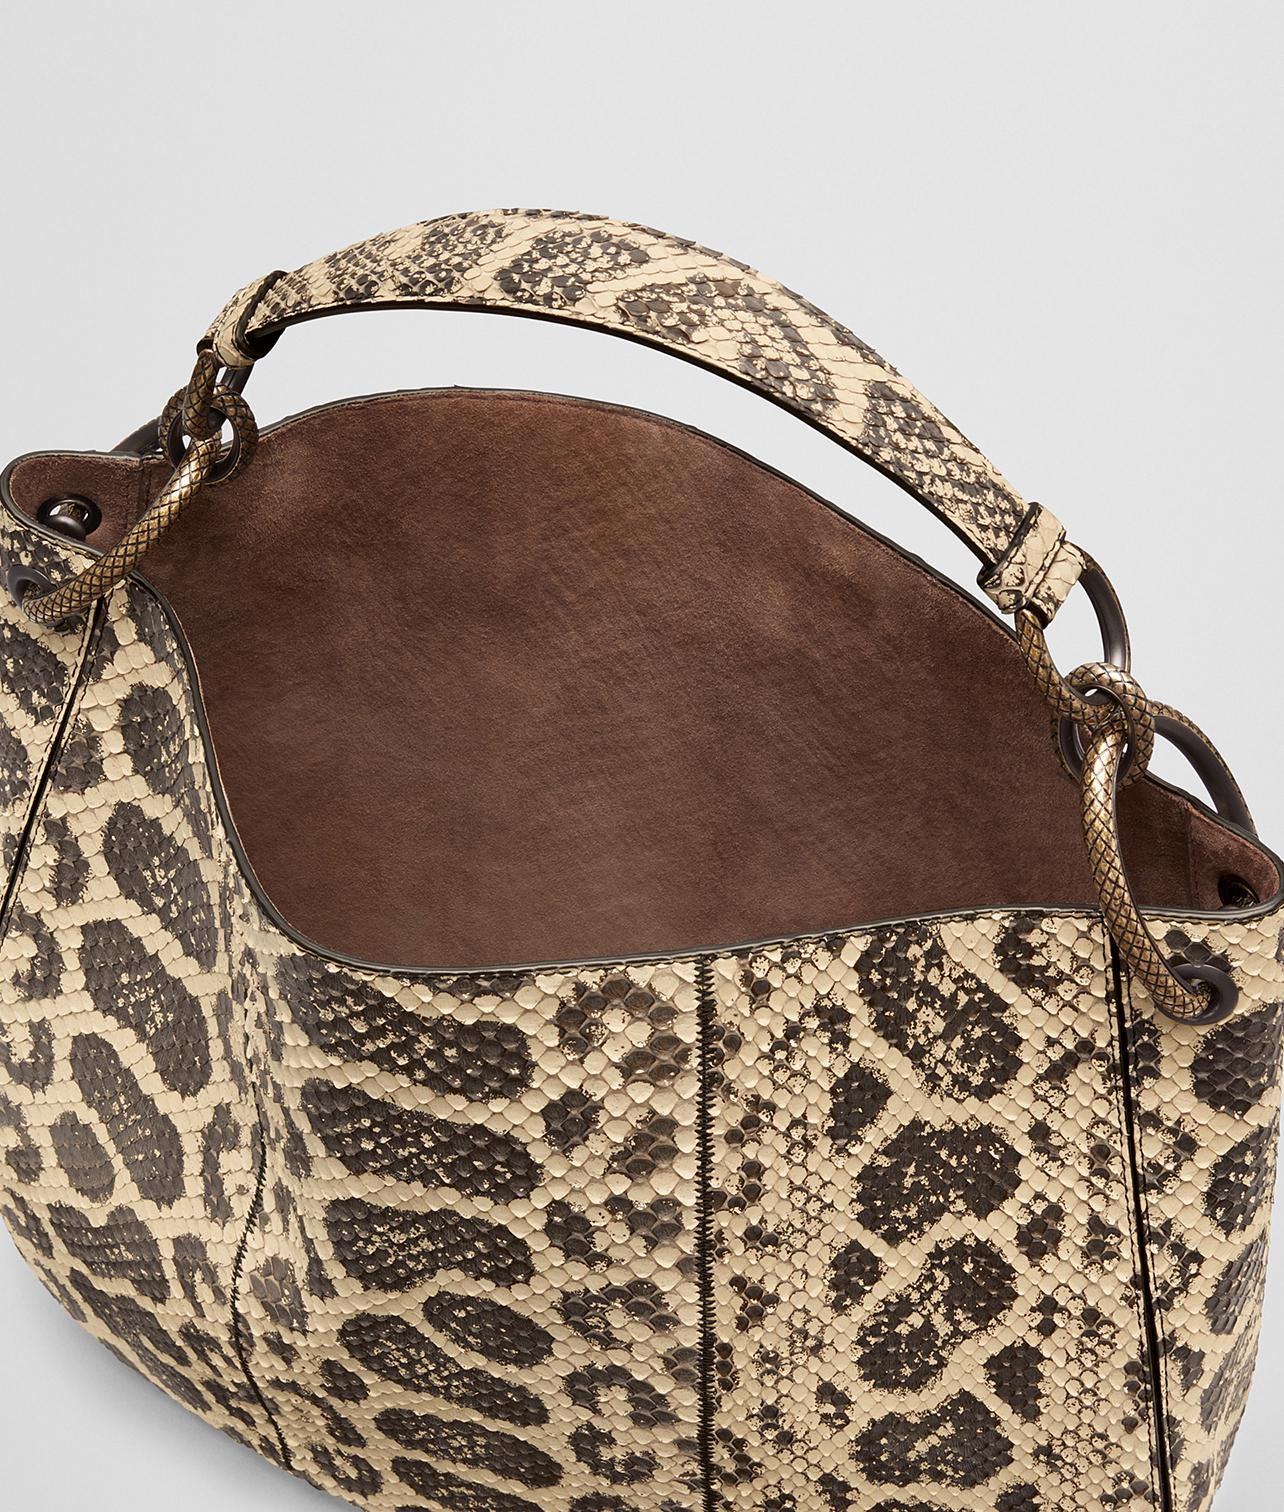 432d20a02b3 Bottega Veneta Natural Anaconda Loop Bag - Lyst